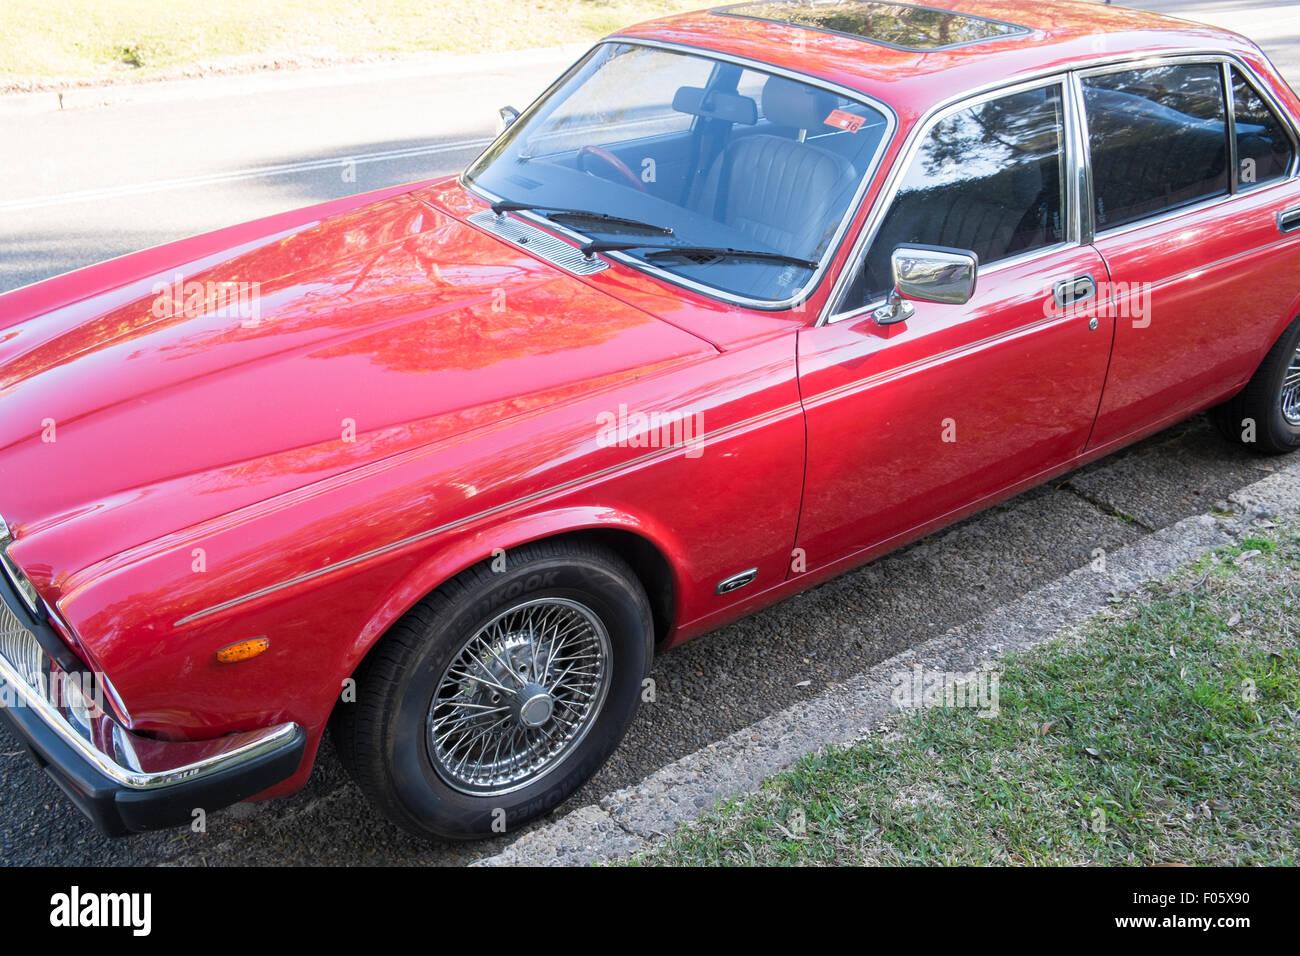 series 3 1985 classic red xj6 jaguar 4 door saloon car in. Black Bedroom Furniture Sets. Home Design Ideas